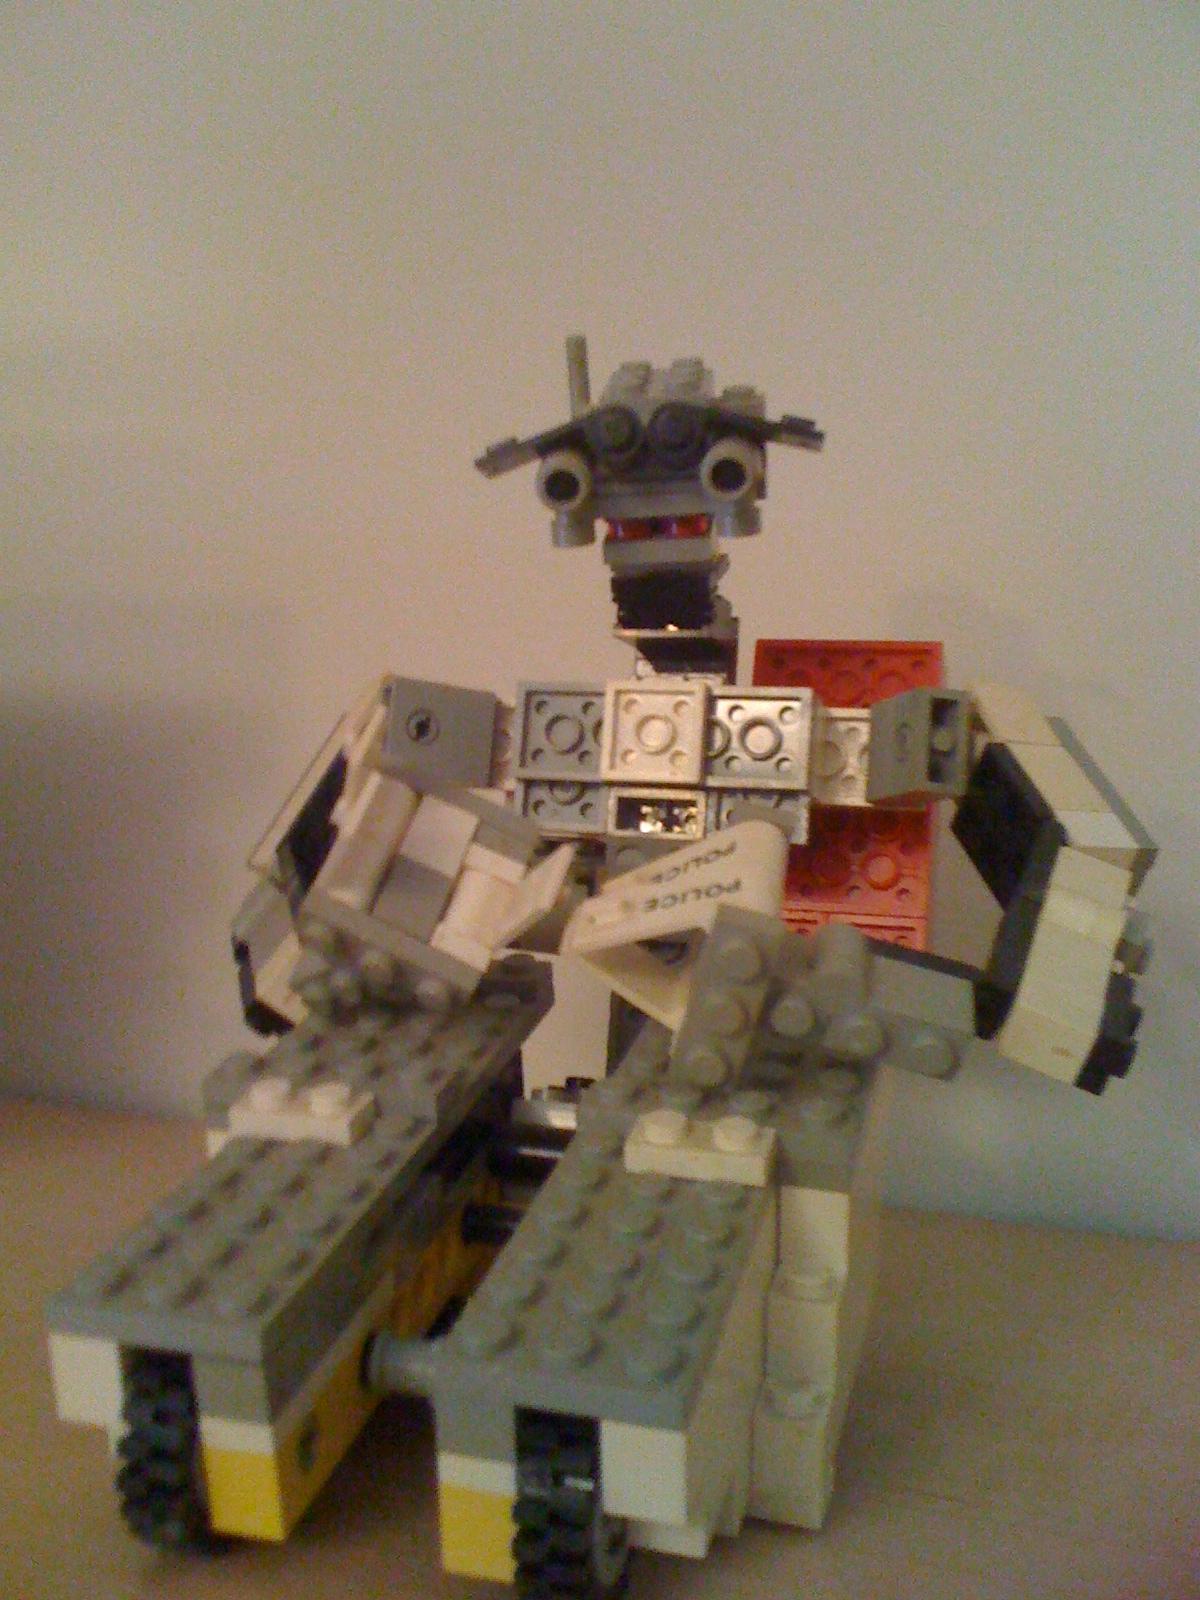 Lego Johnny 5 Instructions By Matt De Lanoy Pinterest Five Tumblr Inasense Lost More Like Zero Monkeyblog Monkeydo